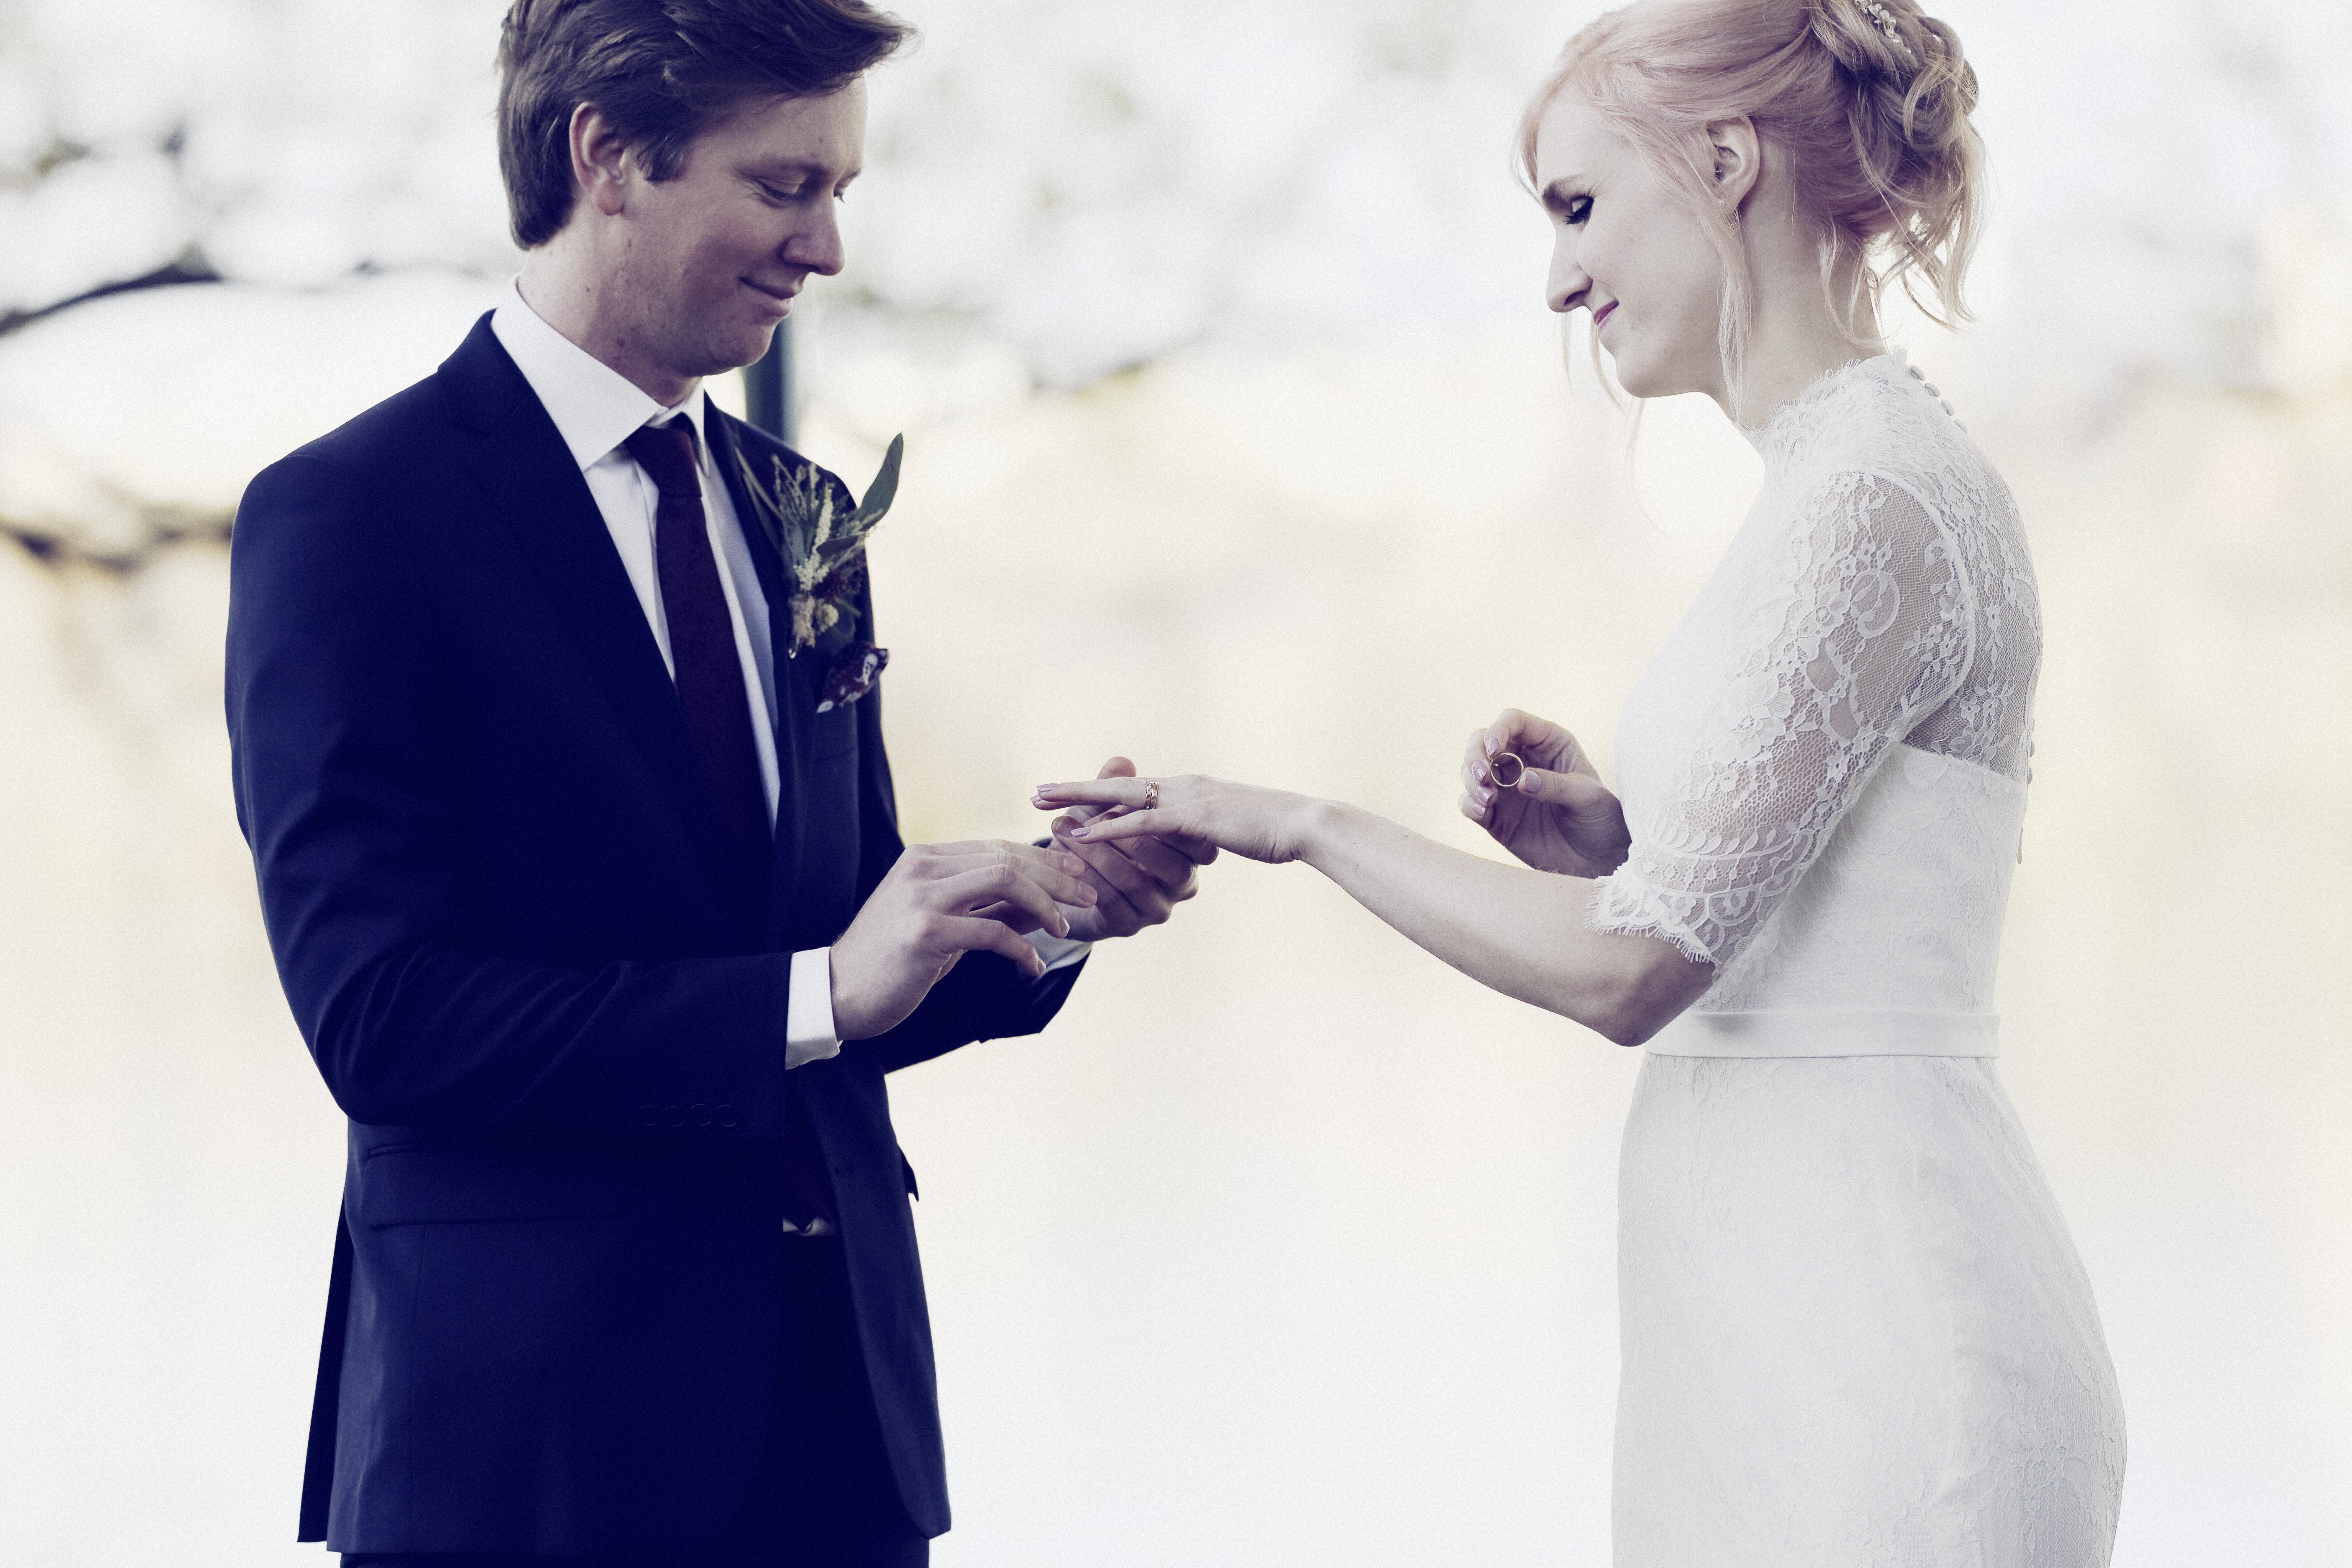 Vigselceremoni 2, höstbröllop